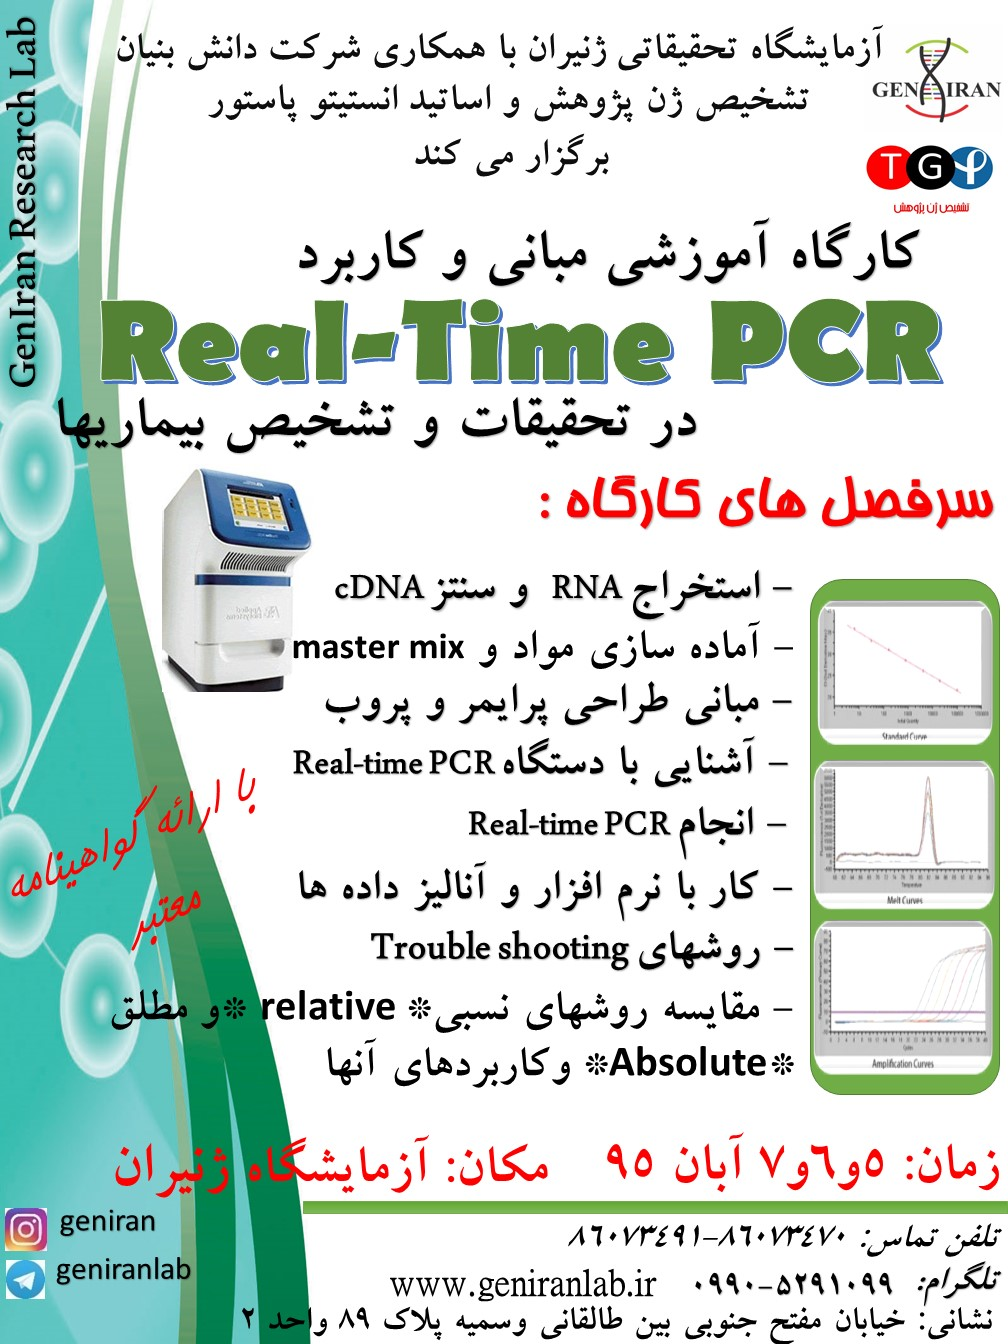 real-time-%d9%be%d9%88%d8%b3%d8%aa%d8%b1-3